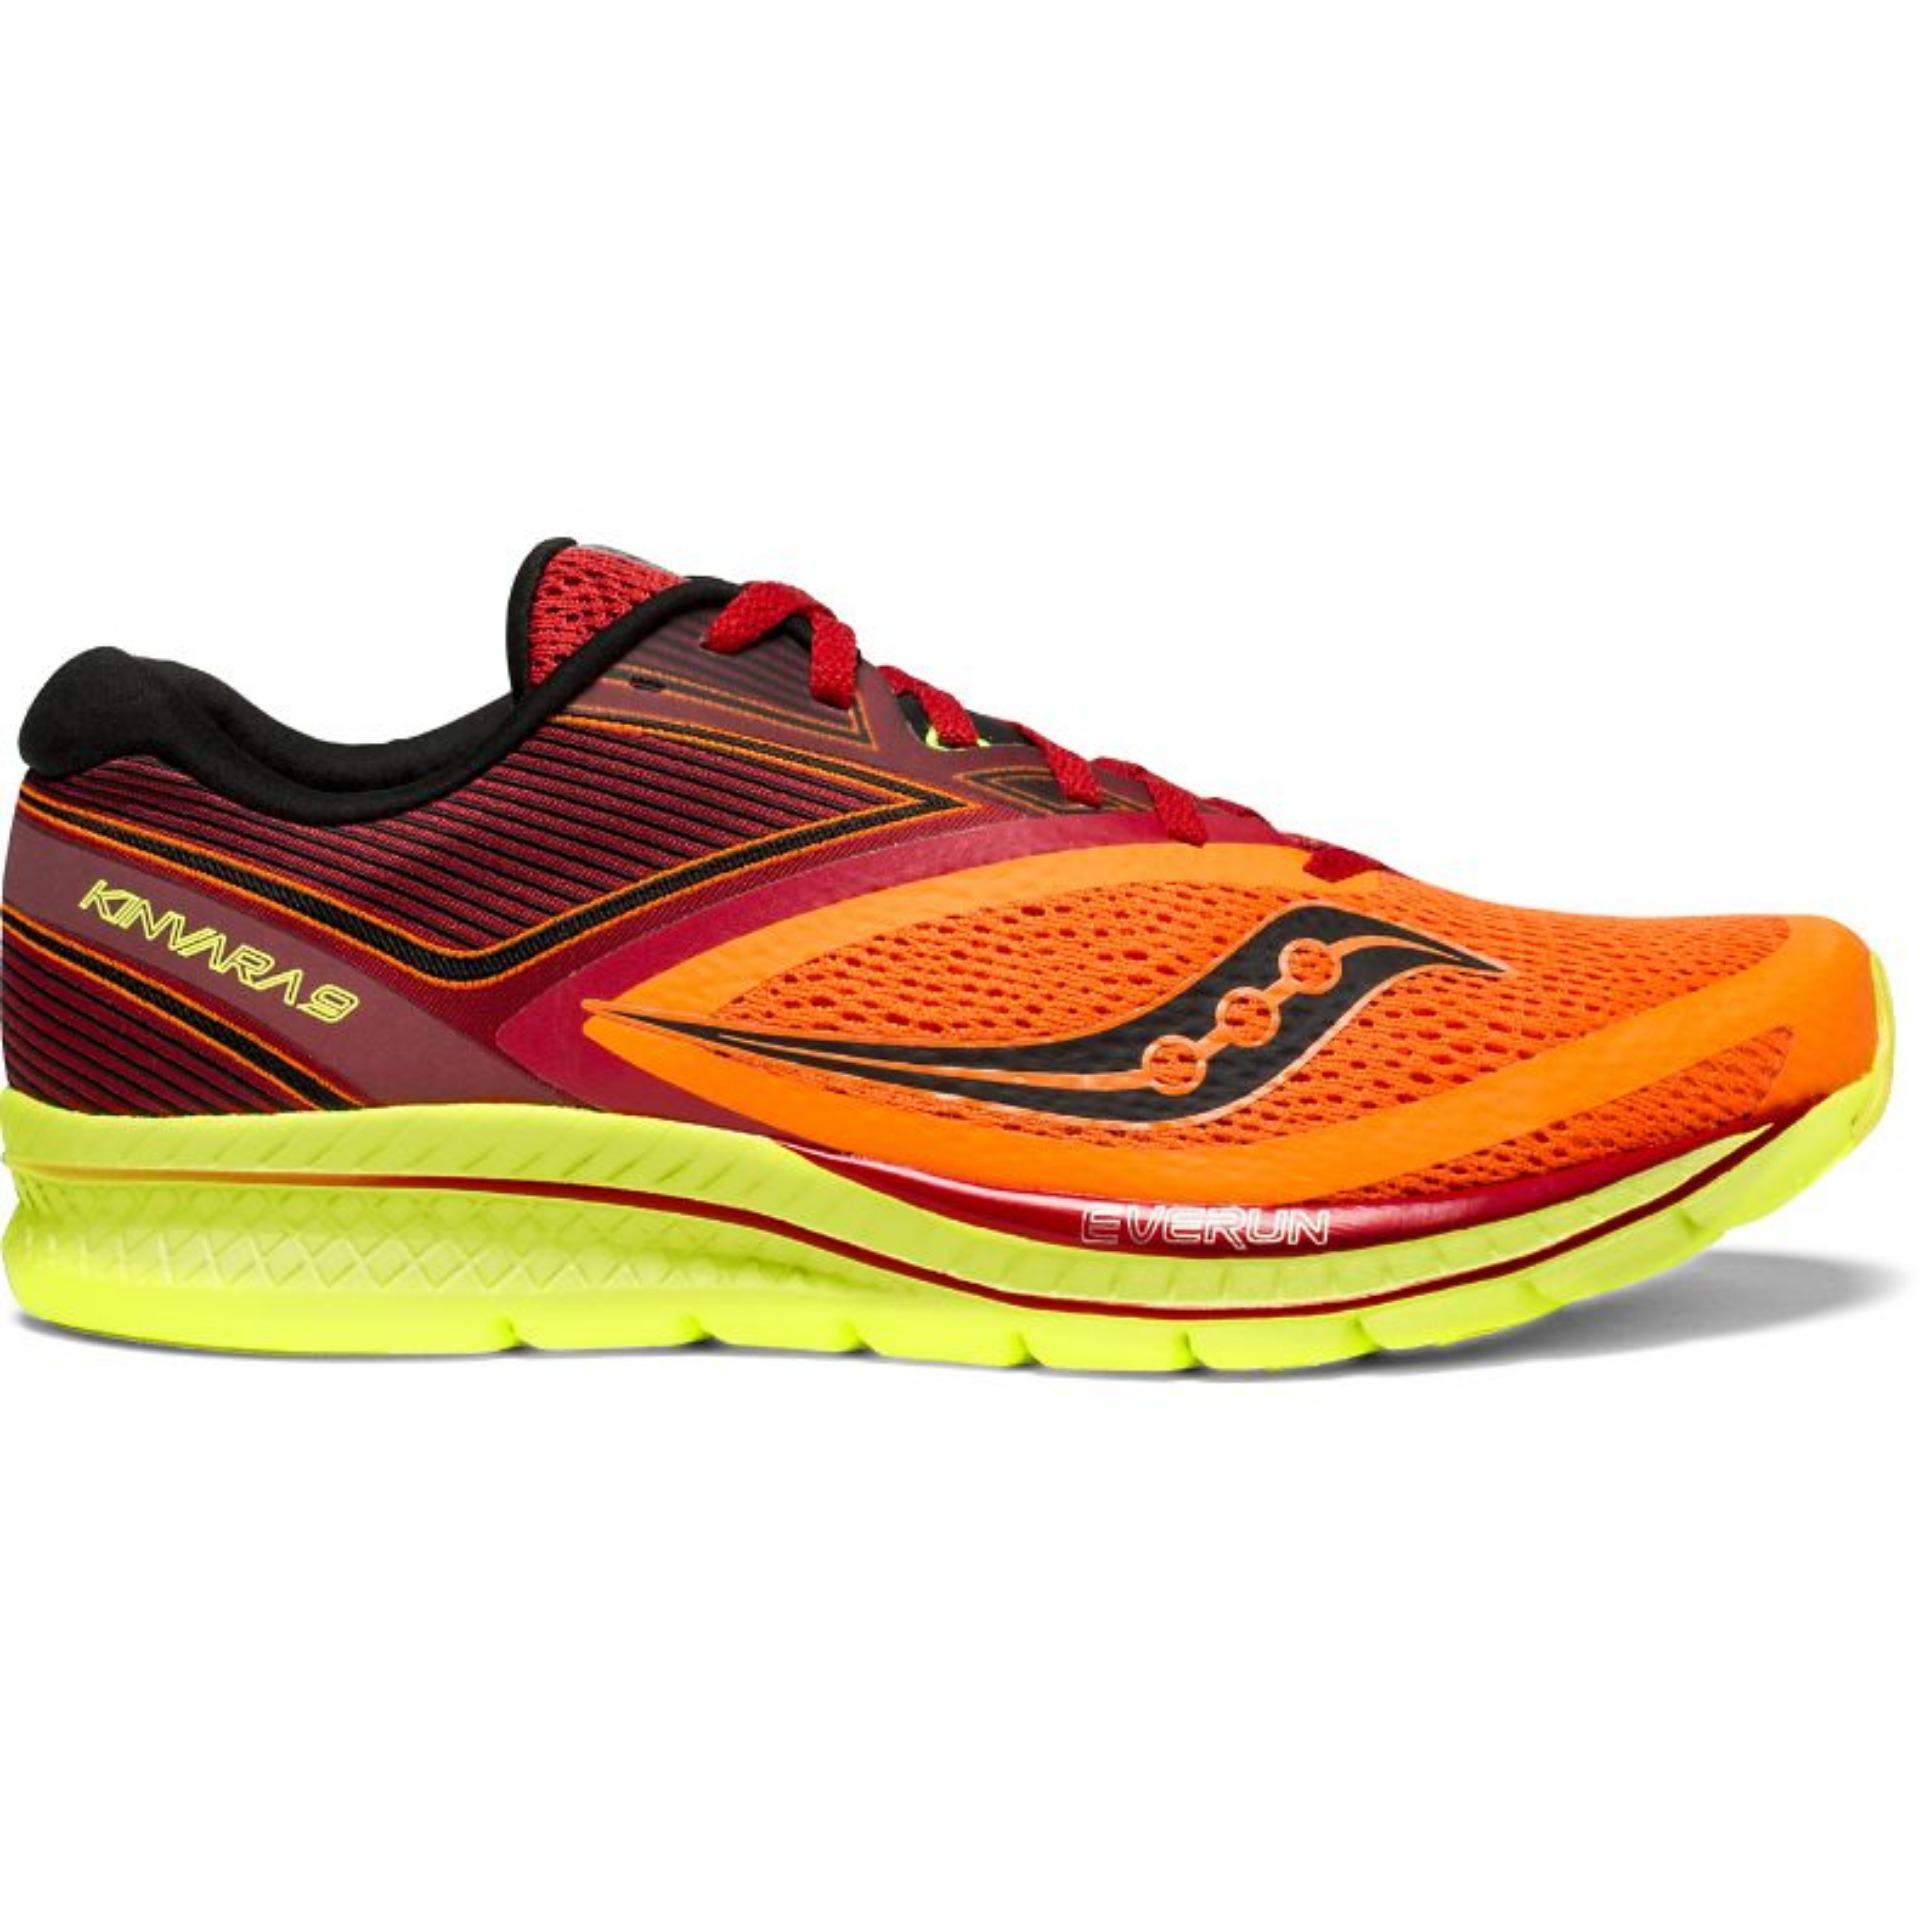 Discount Saucony Kinvara 9 Running Shoes S20418 1 Saucony